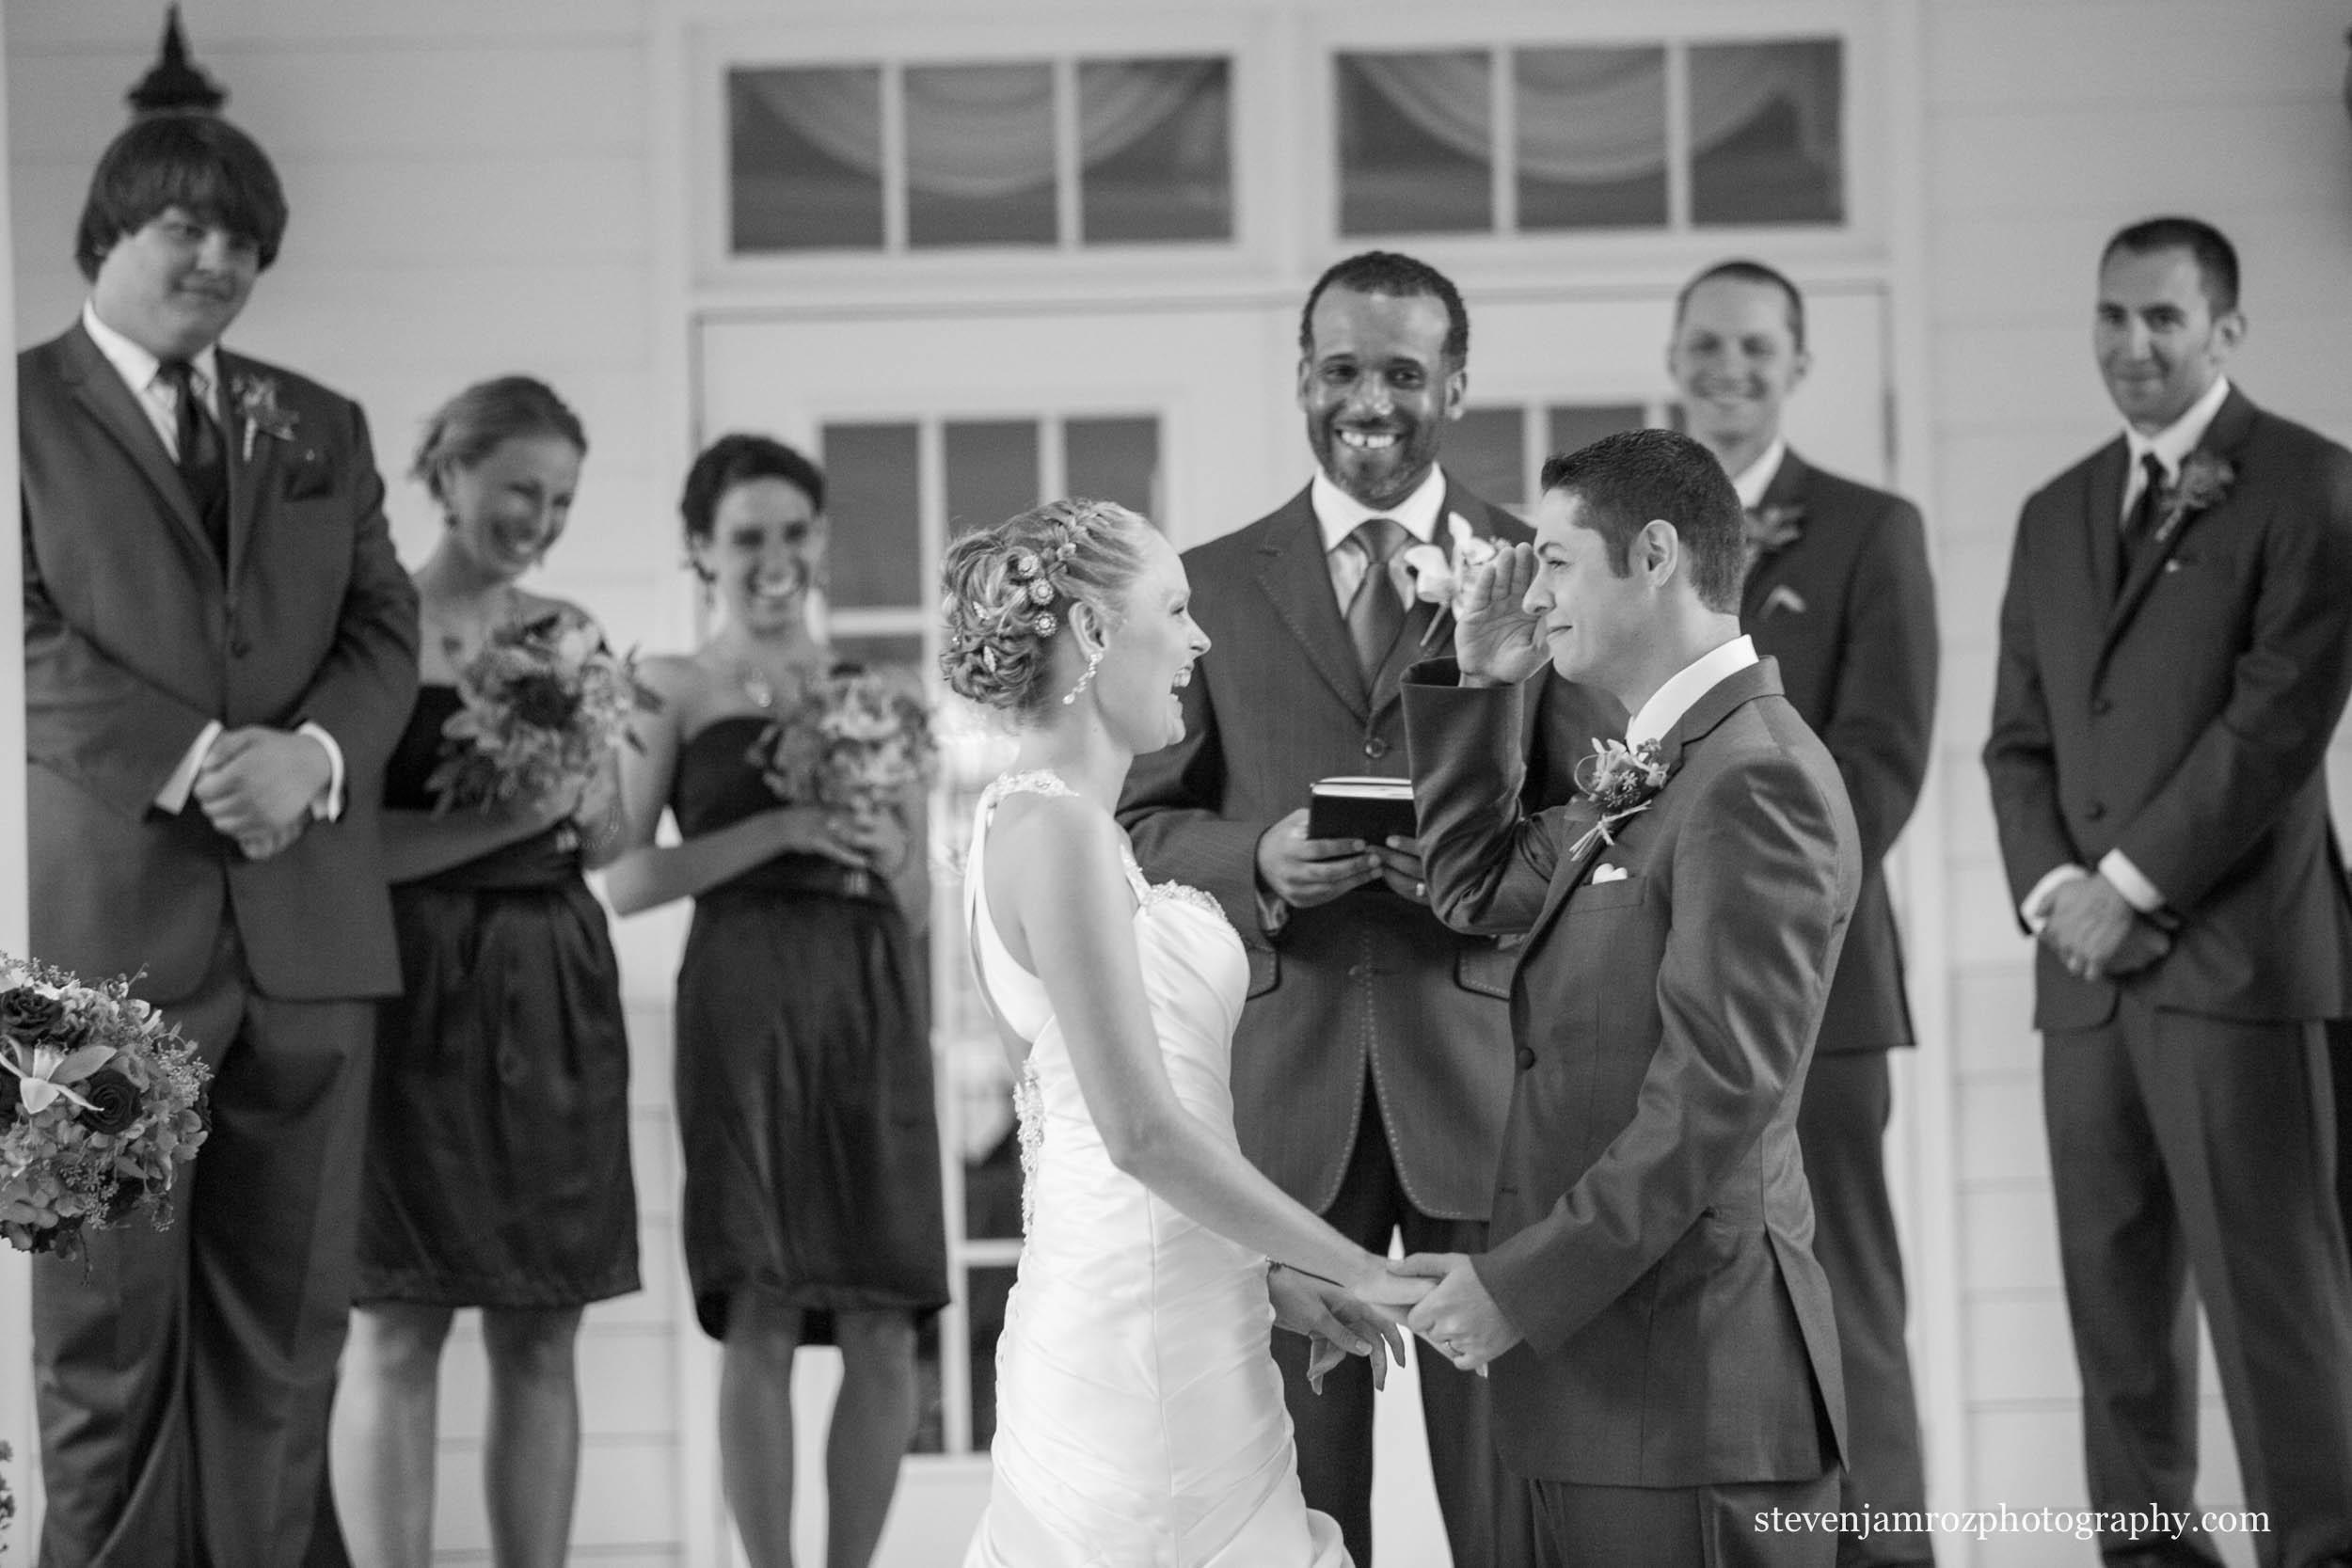 lakeview-covered-veranda-wedding-hudson-manor-steven-jamroz-photography-0204.jpg